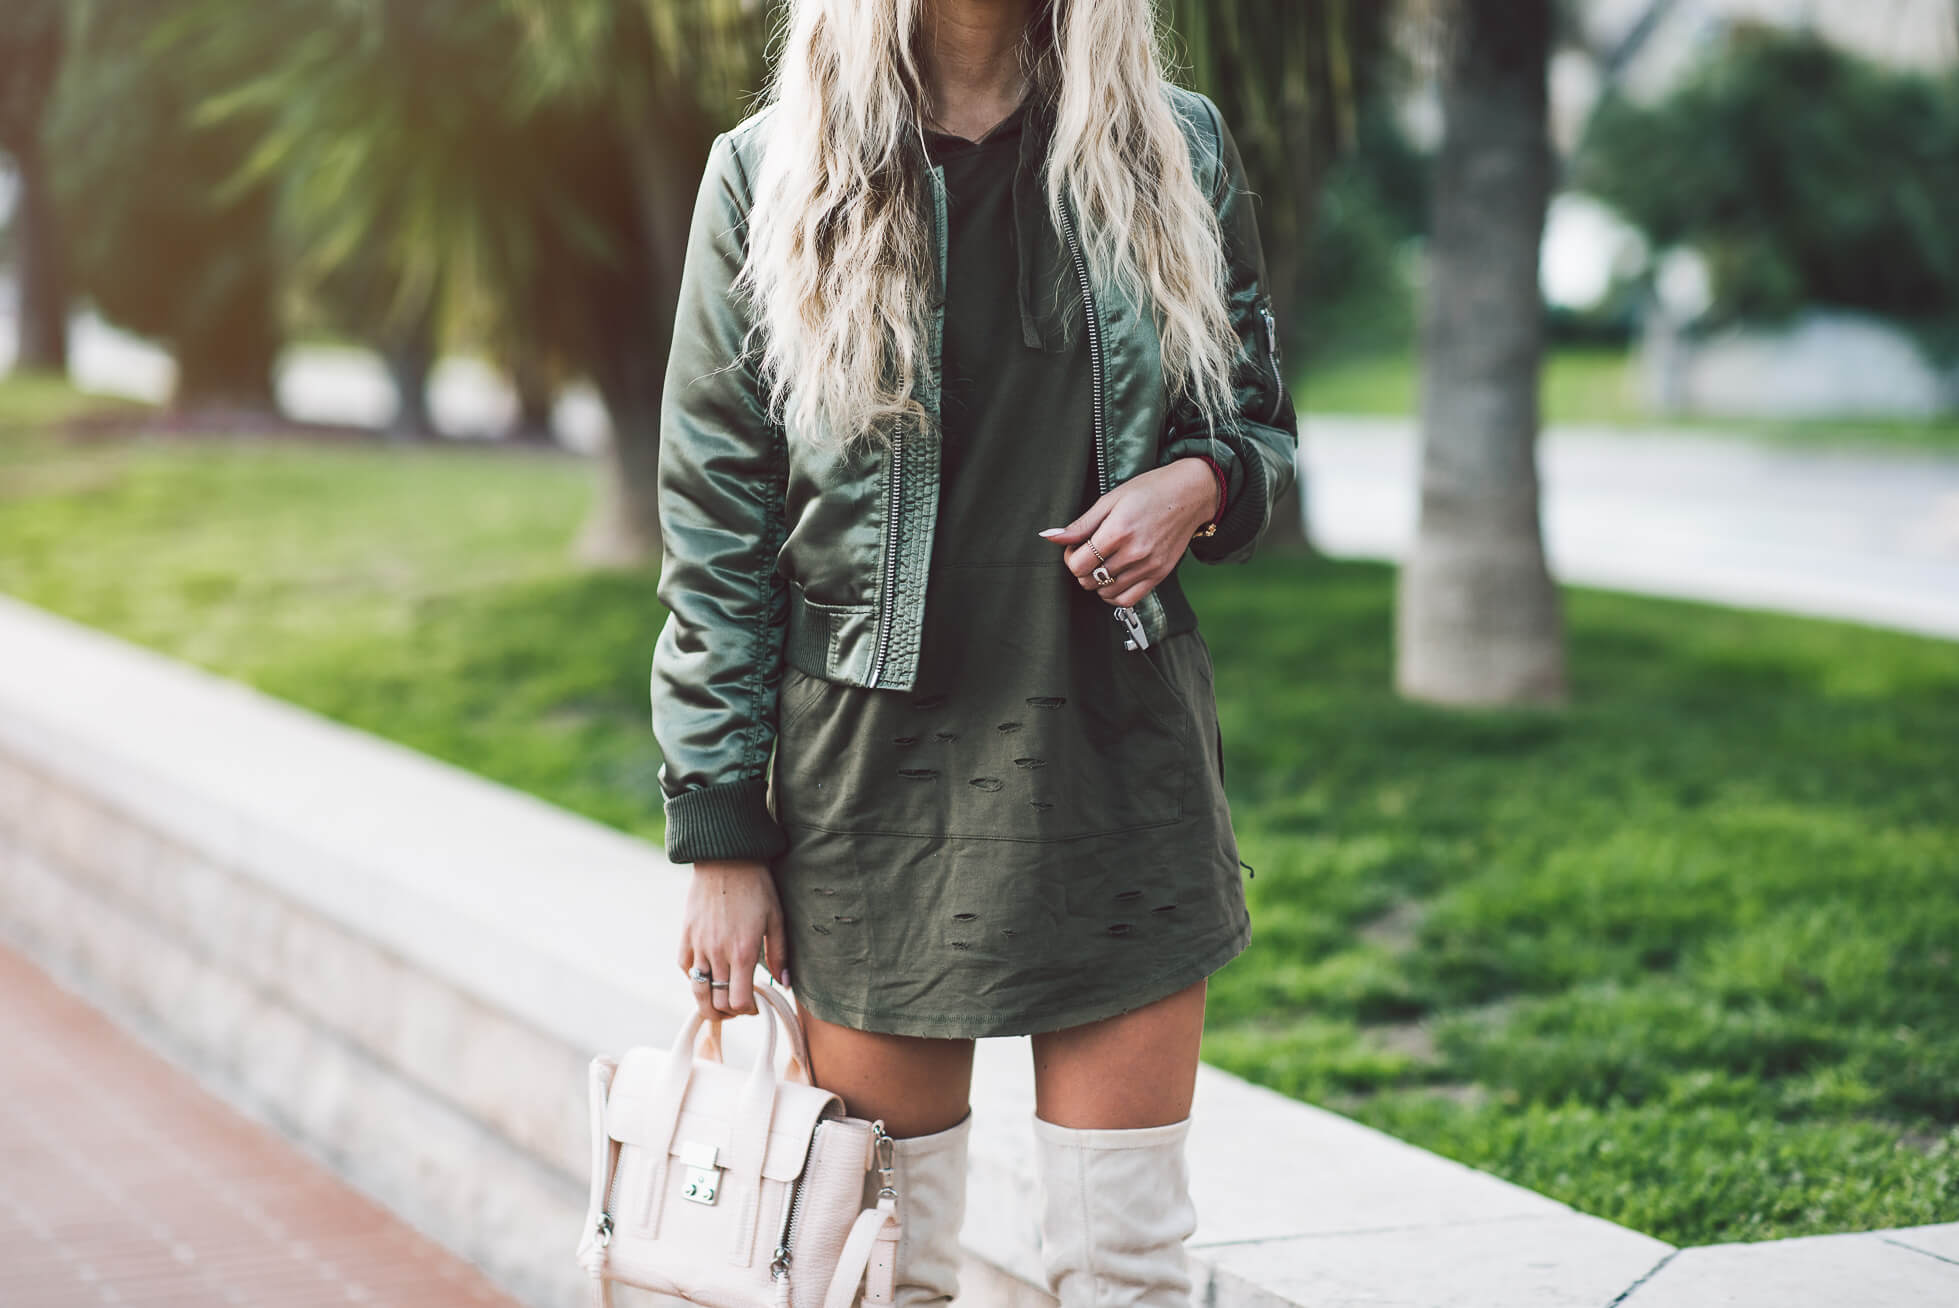 janni-deler-green-outfitDSC_9158-Redigera